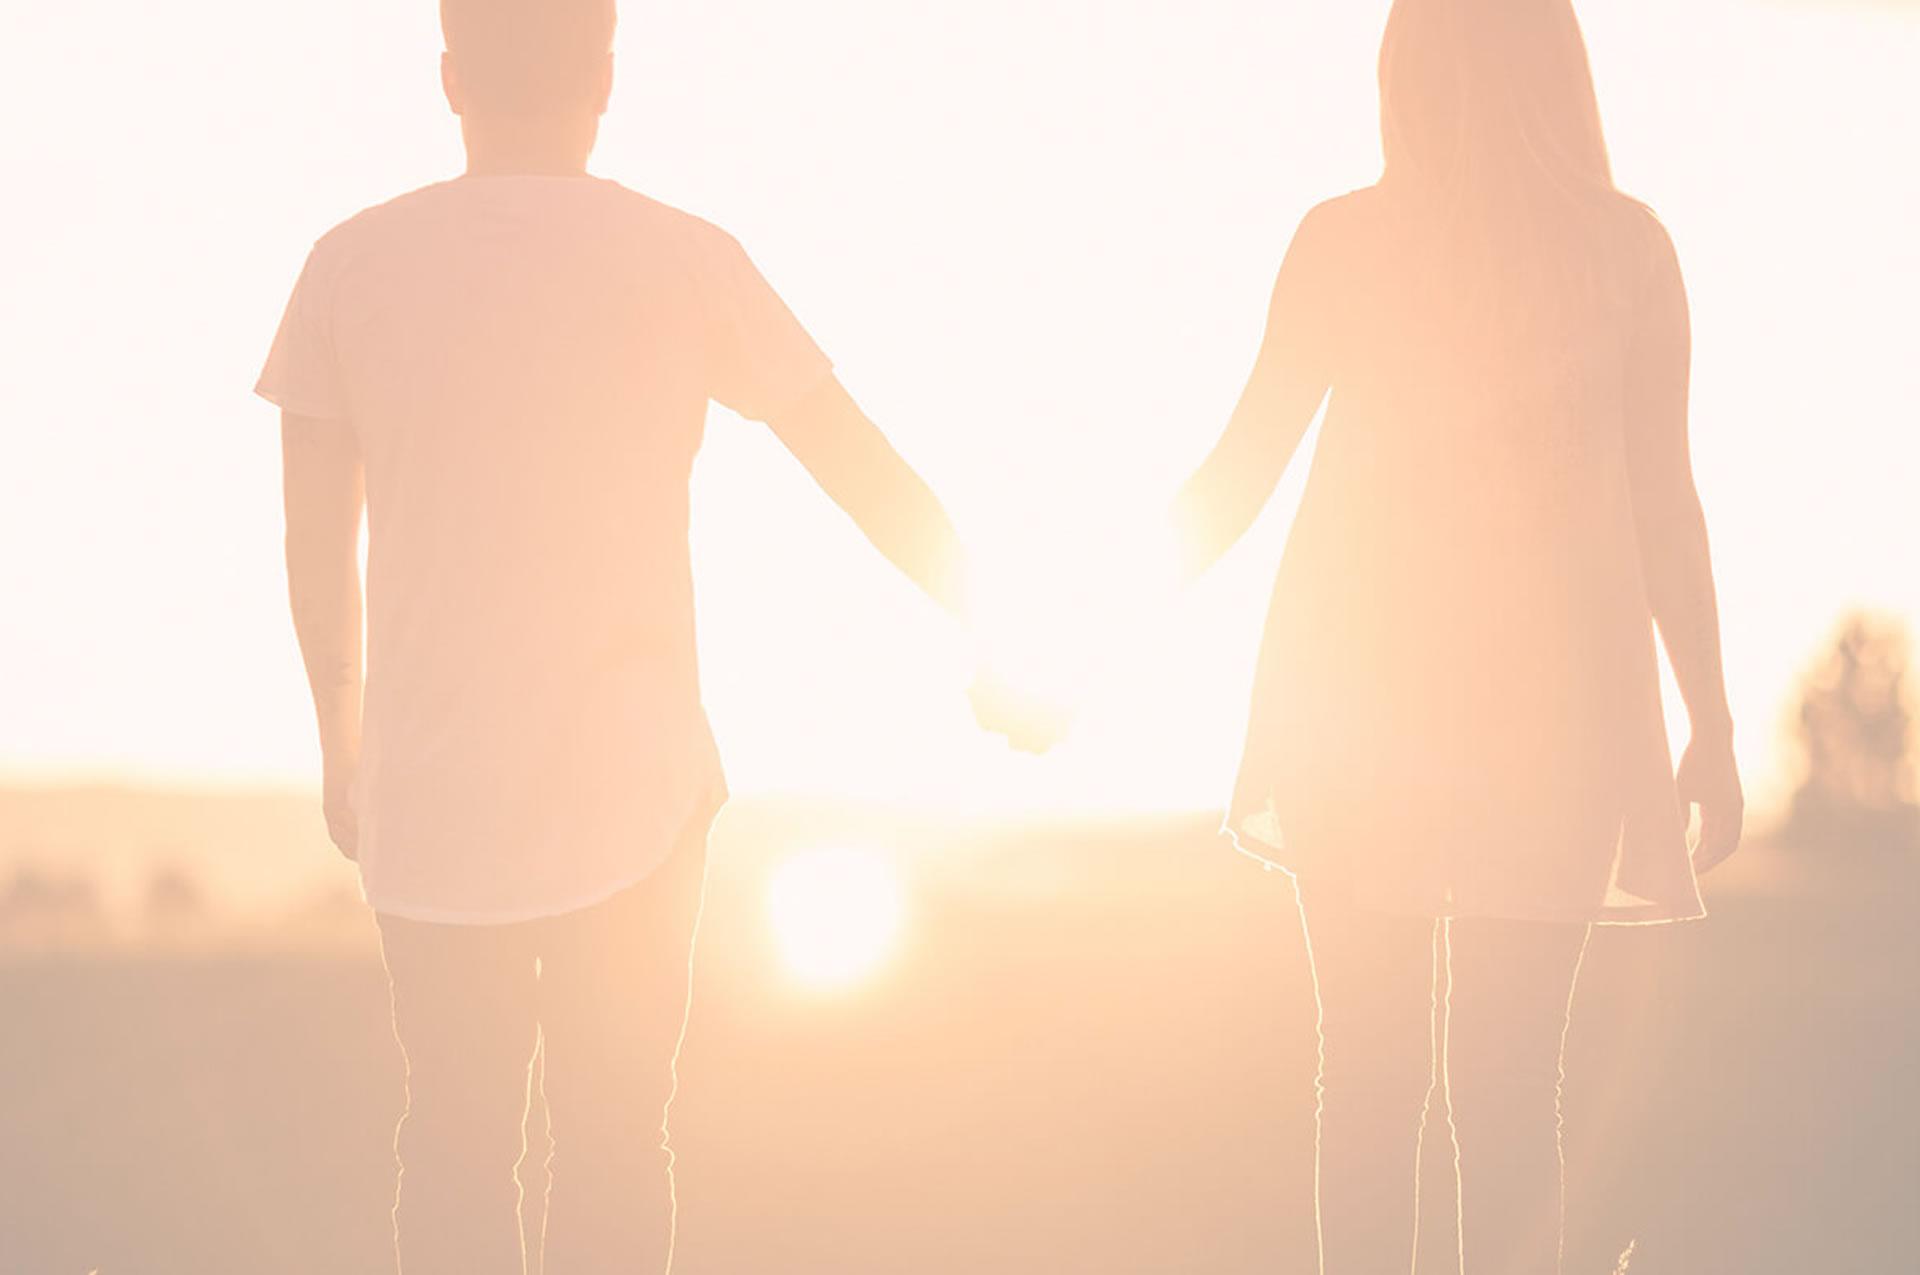 Fresh start through divorce or separation with Bison family solicitors in Aldershot